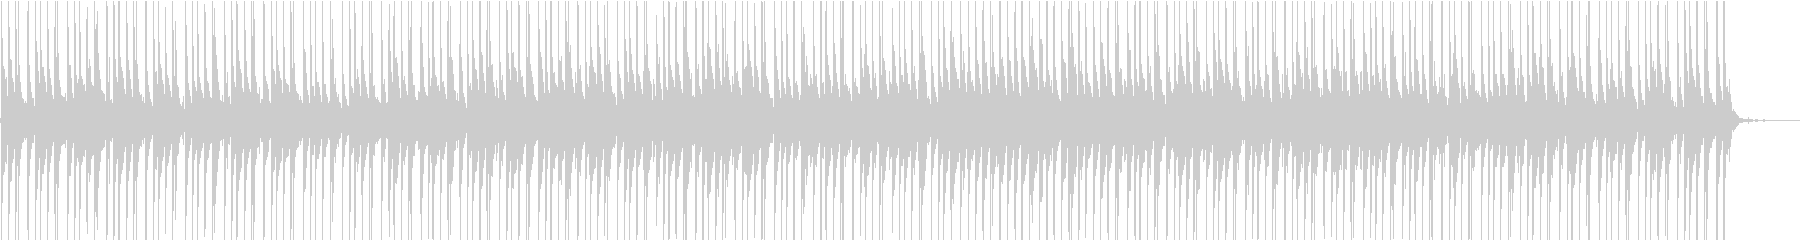 KANTリズミカル無機質BGMの未再生の波形